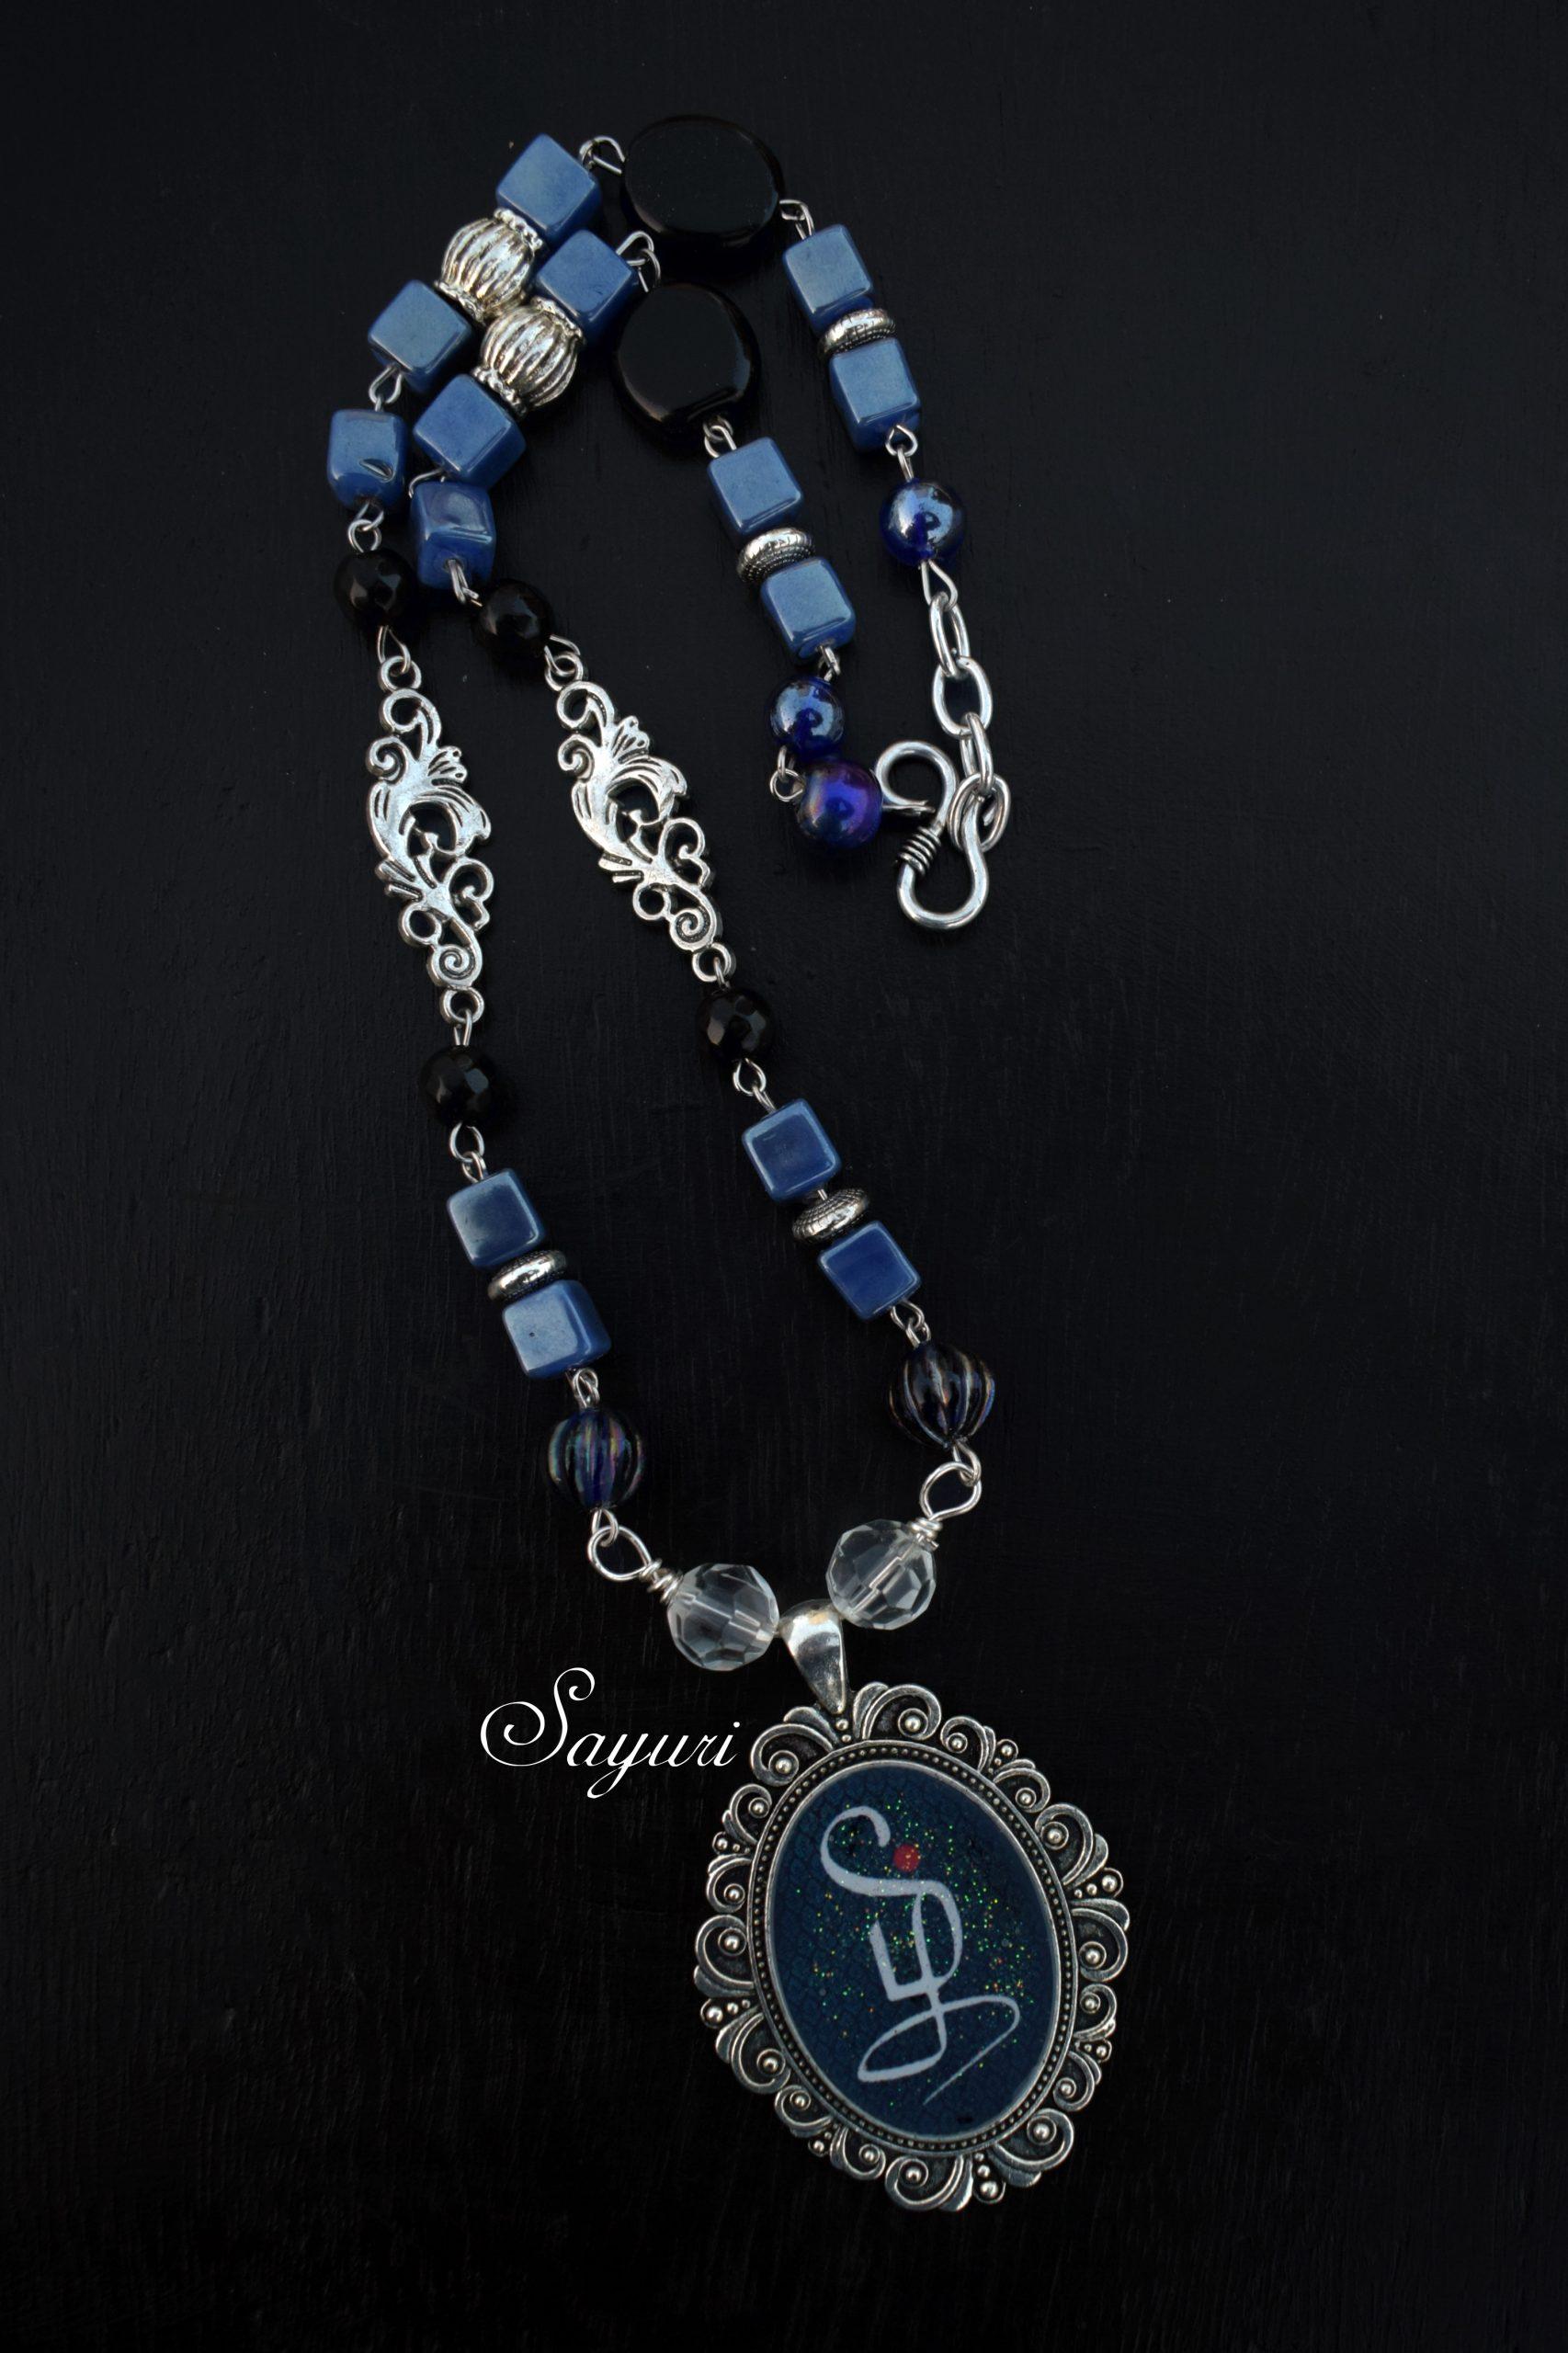 Tamil logo necklace